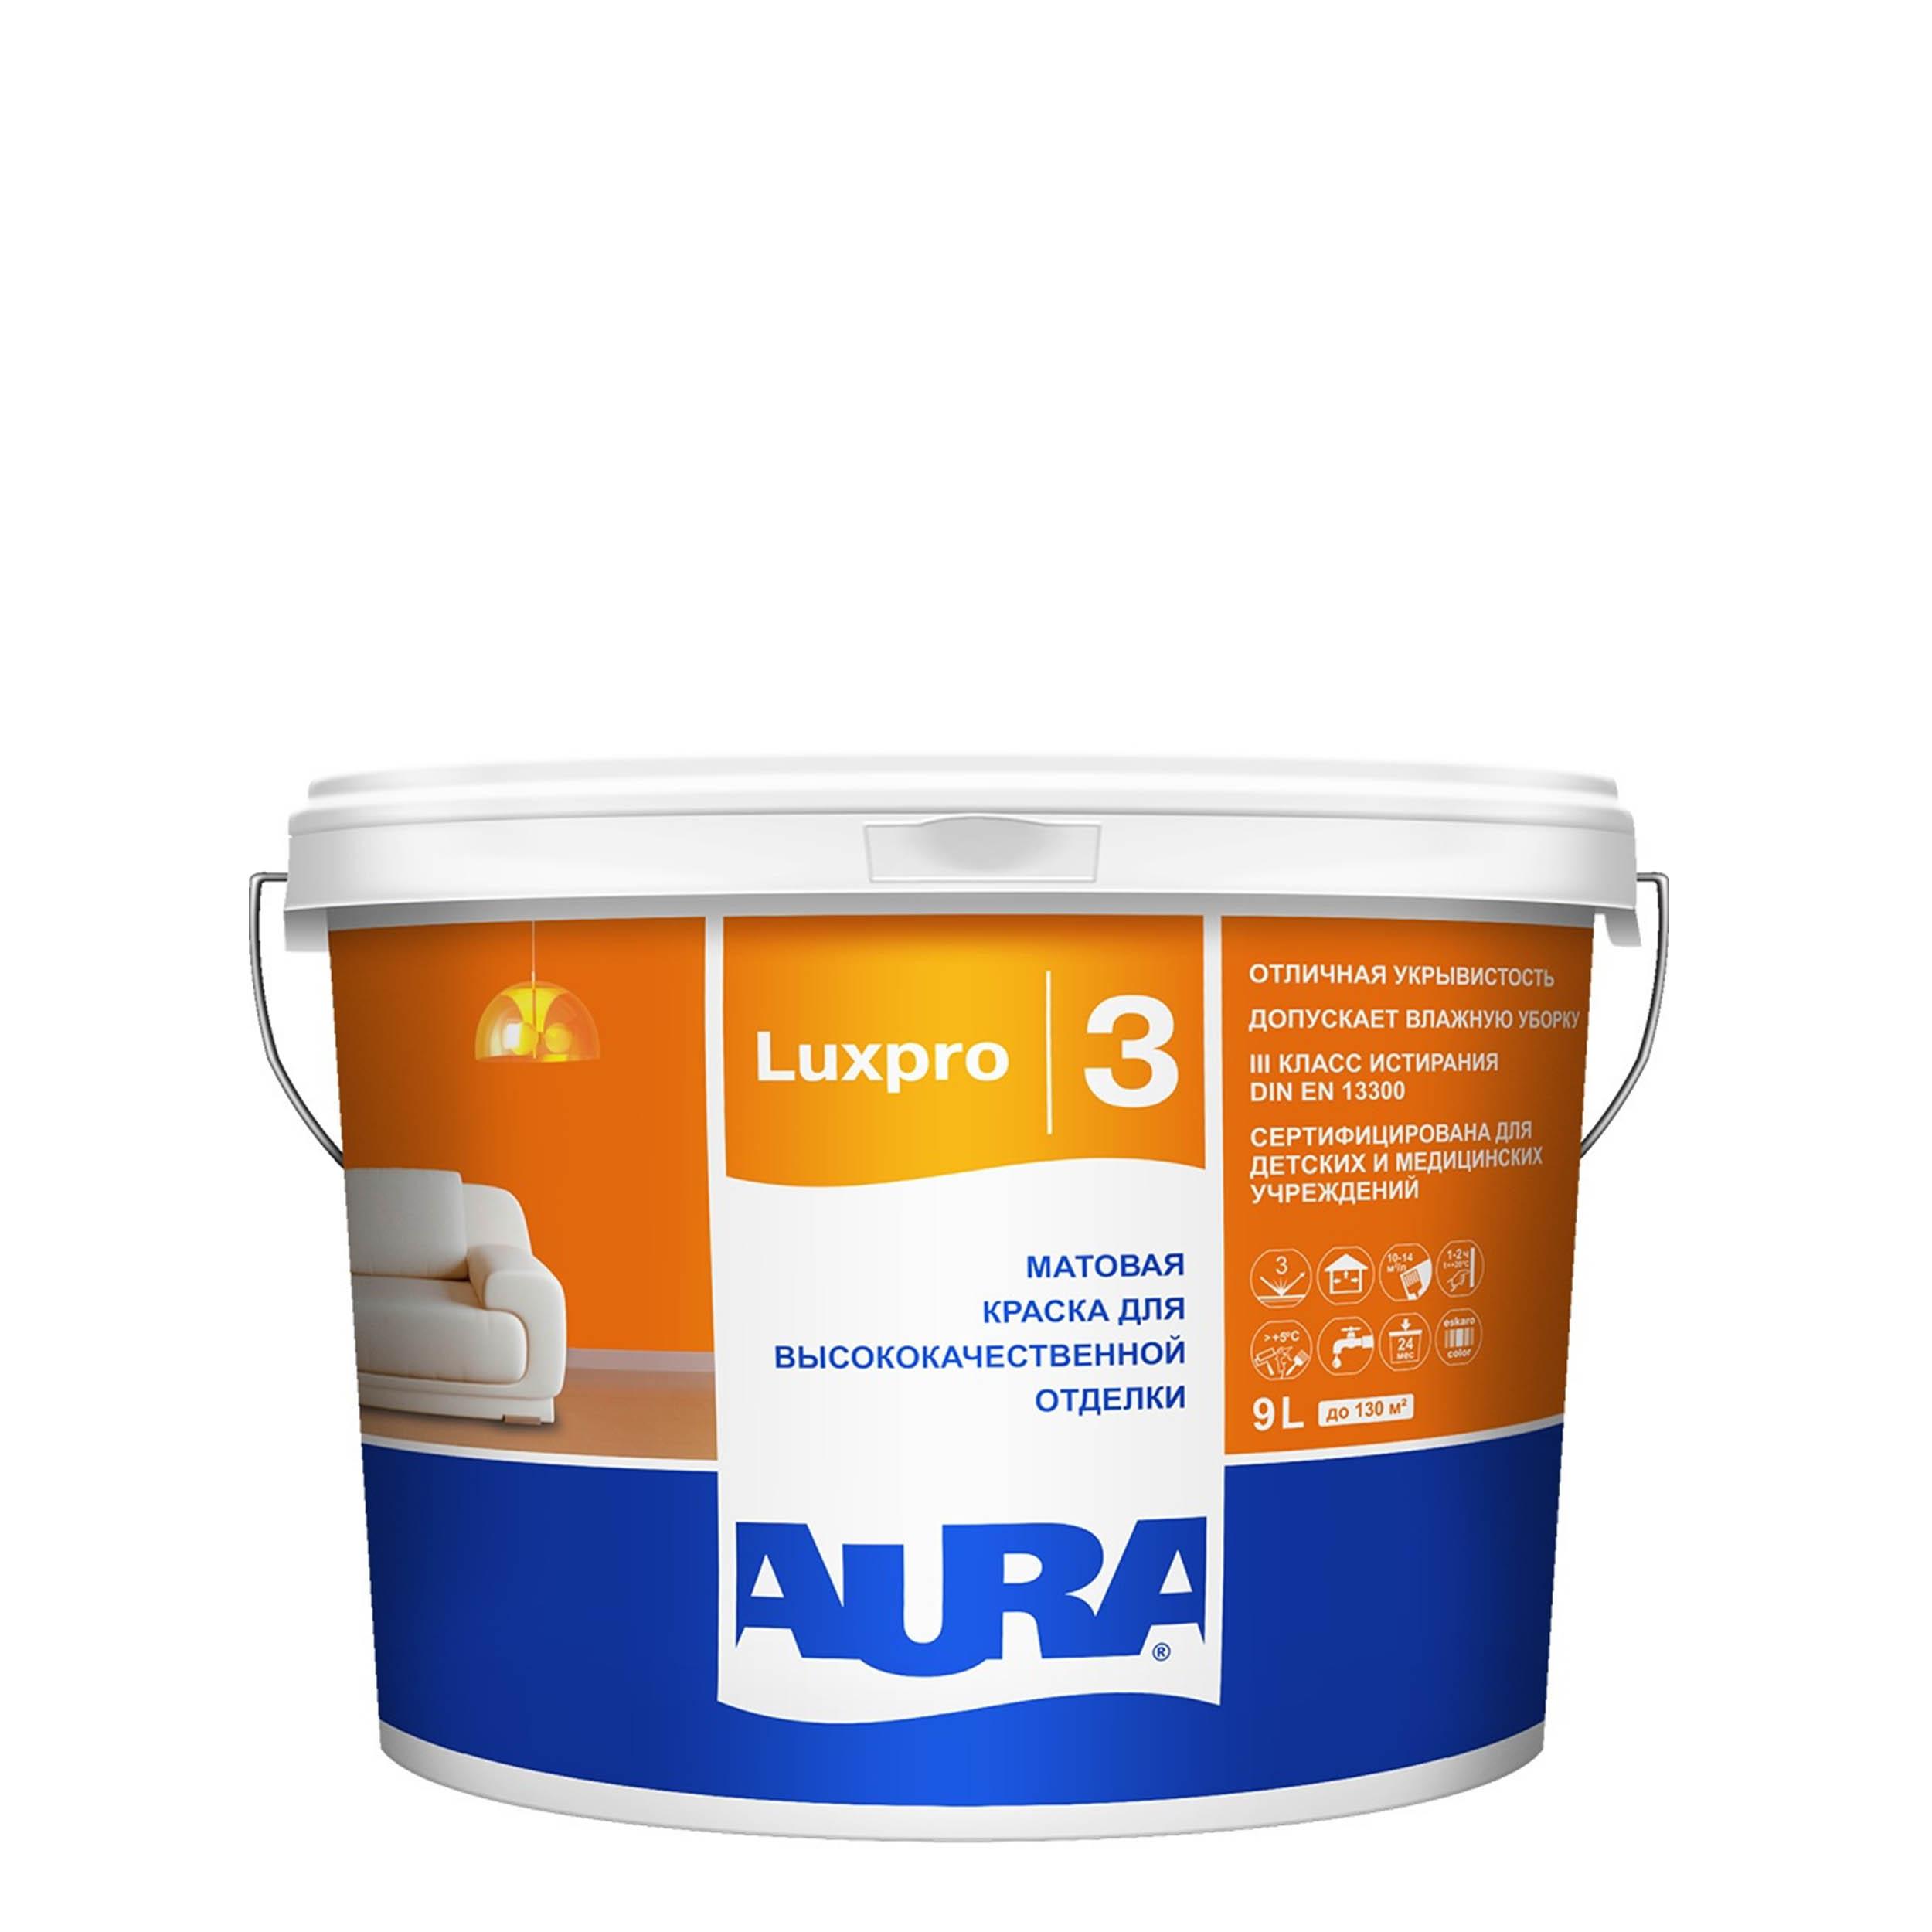 Фото 4 - Краска интерьерная, Aura LuxPRO 3, RAL 6012, 11 кг.